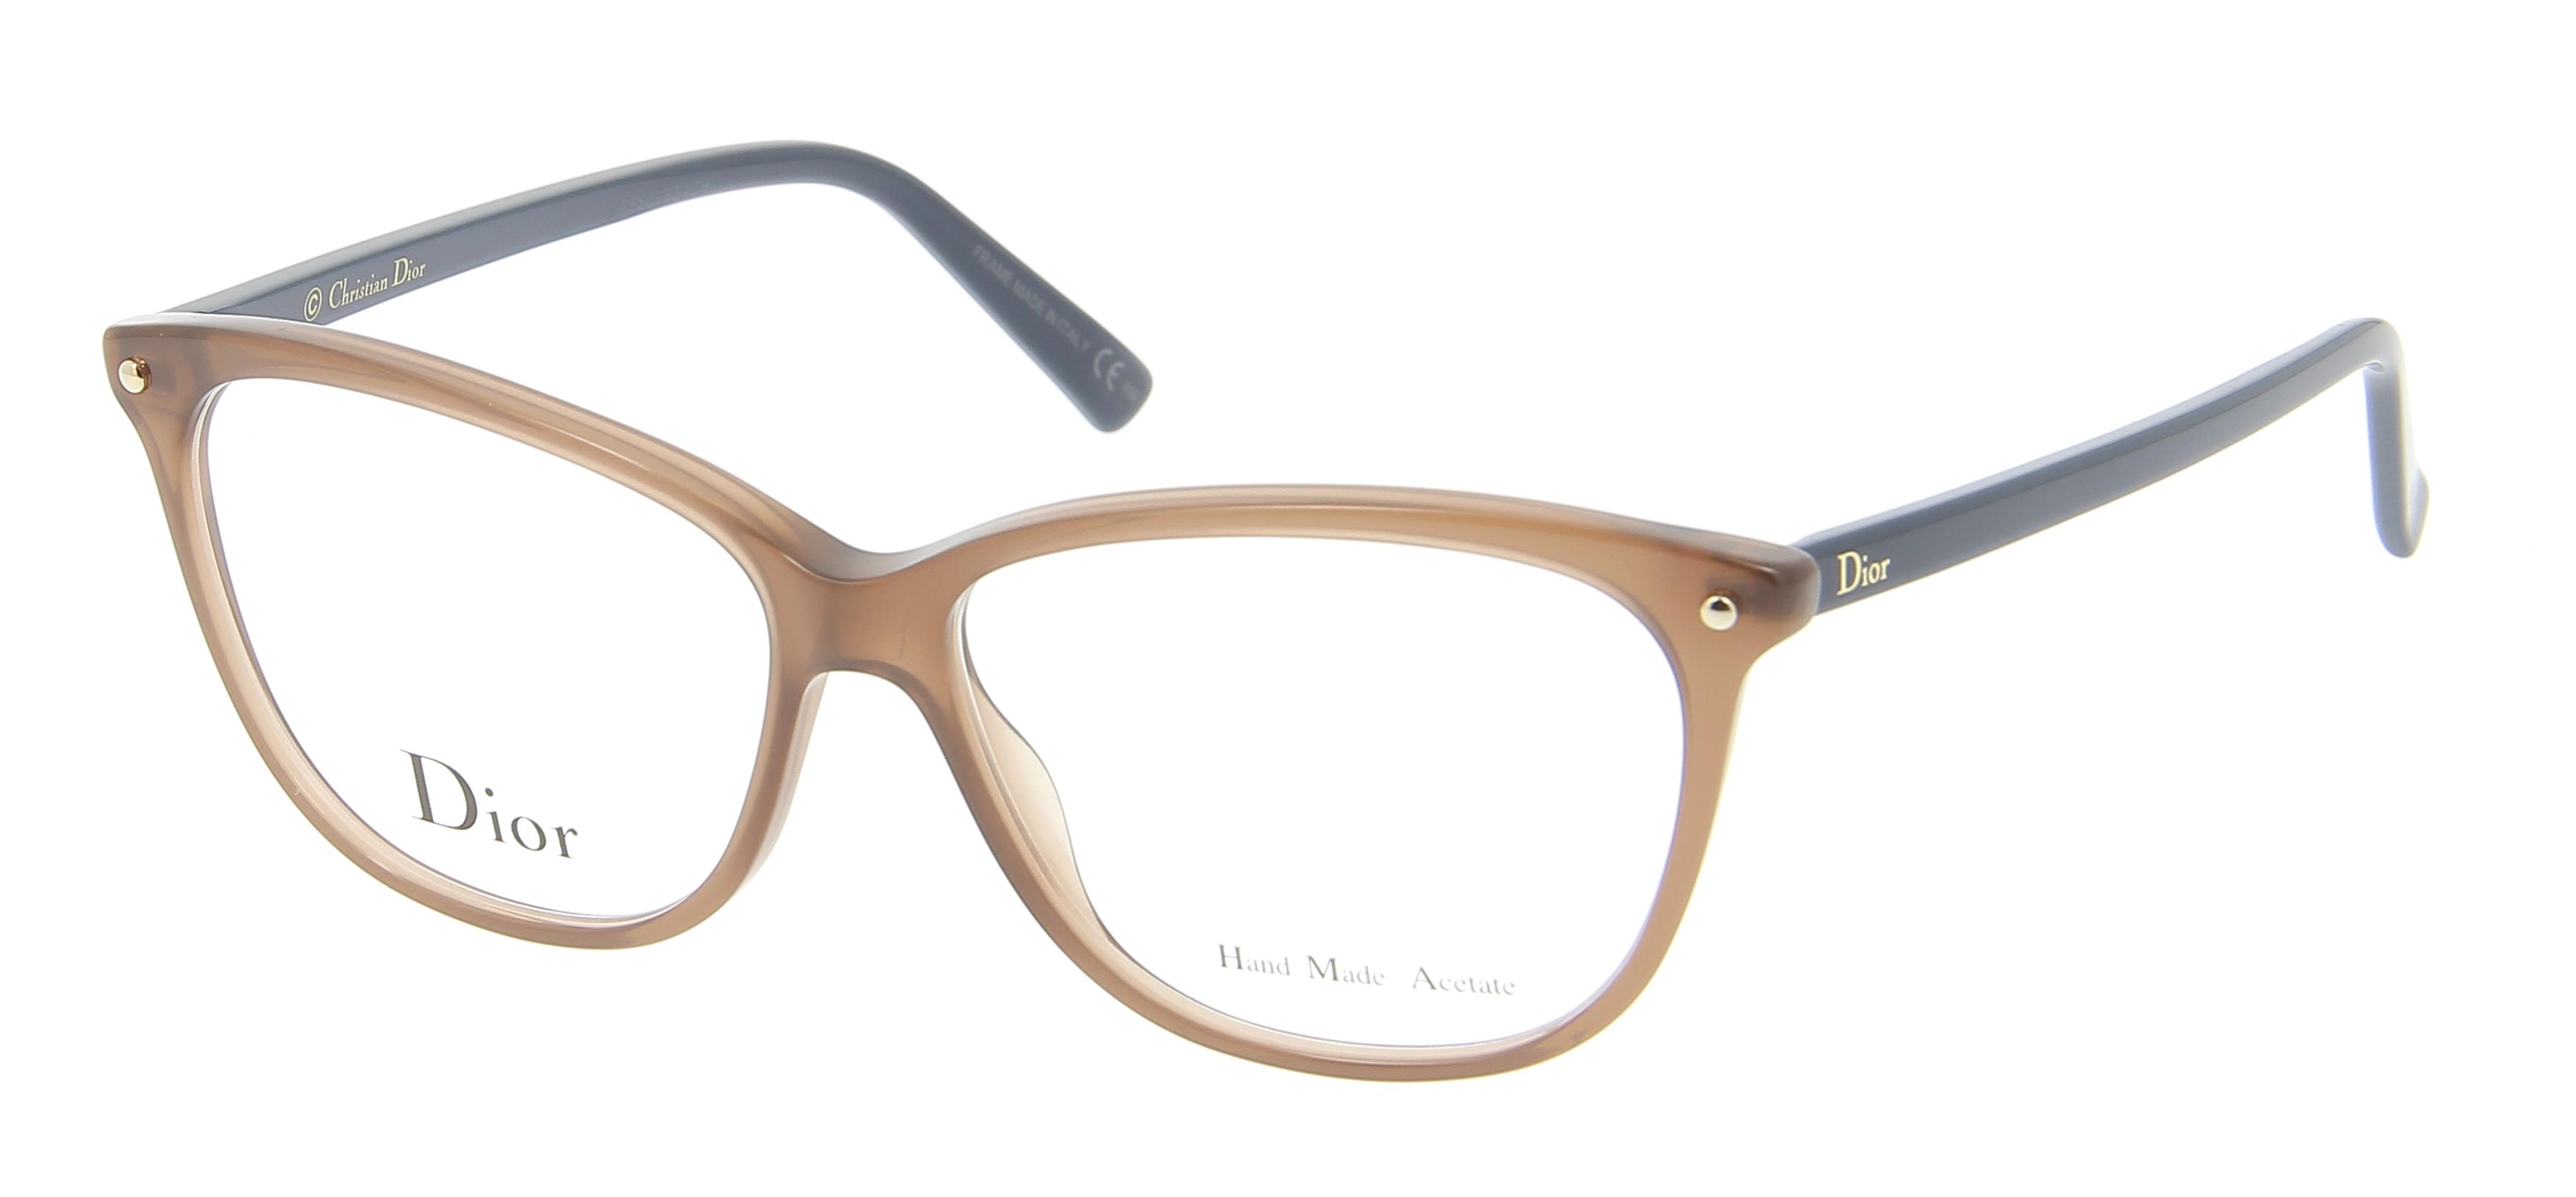 Glasses Frames Dior : Eyeglasses DIOR CD 3270 3LG 53/13 Woman Marron clair ...